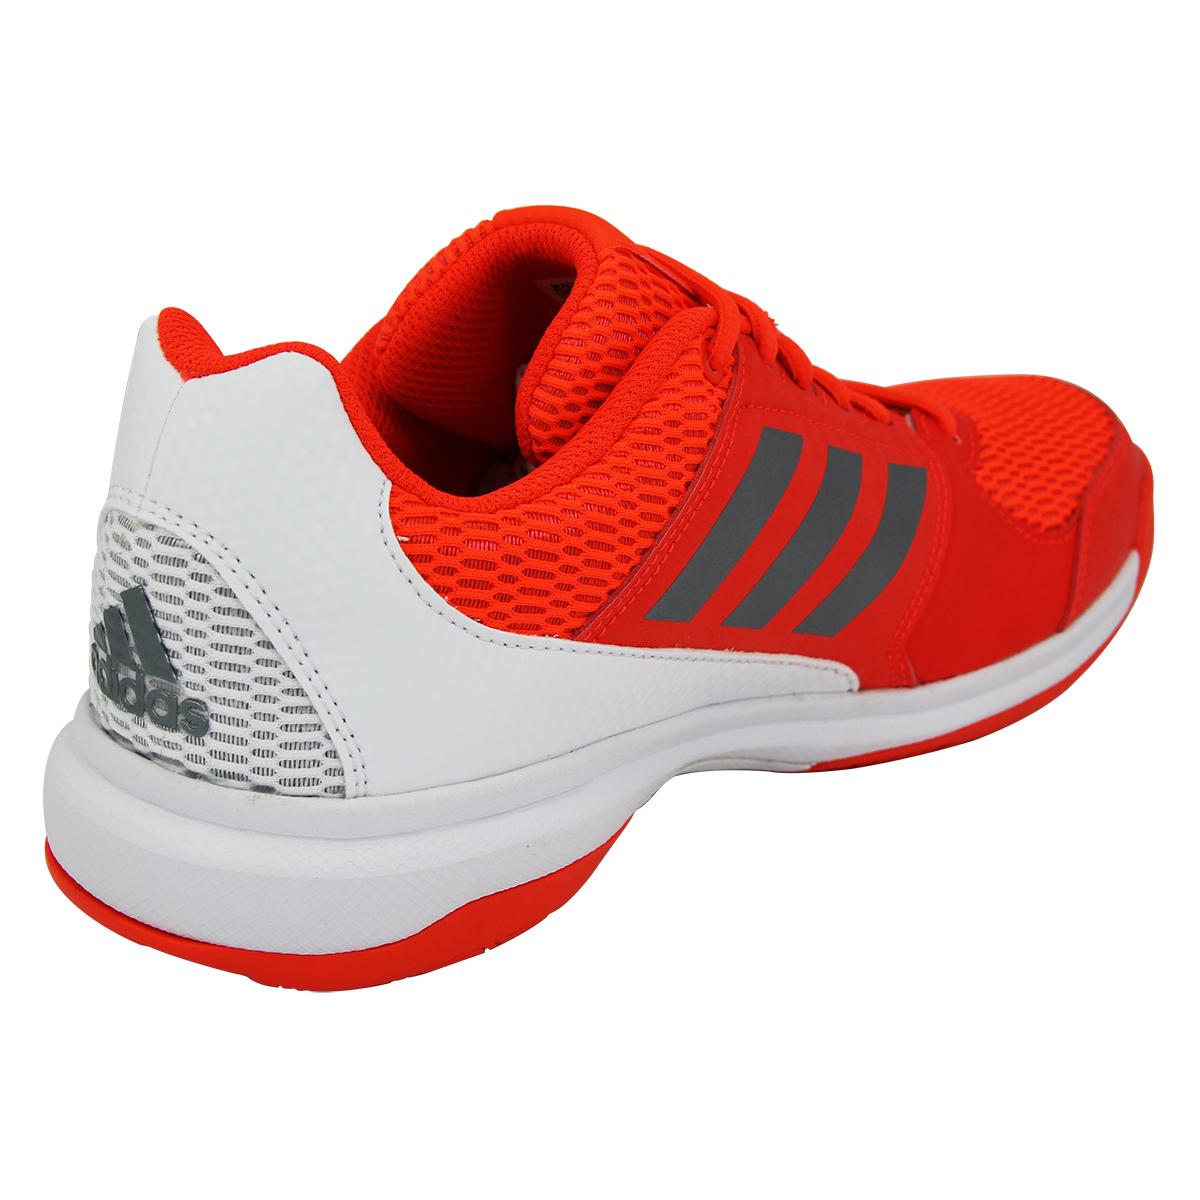 Multido Essence Handball Adidas De Chaussures Adiwear Homme 4Aj5Rq3L